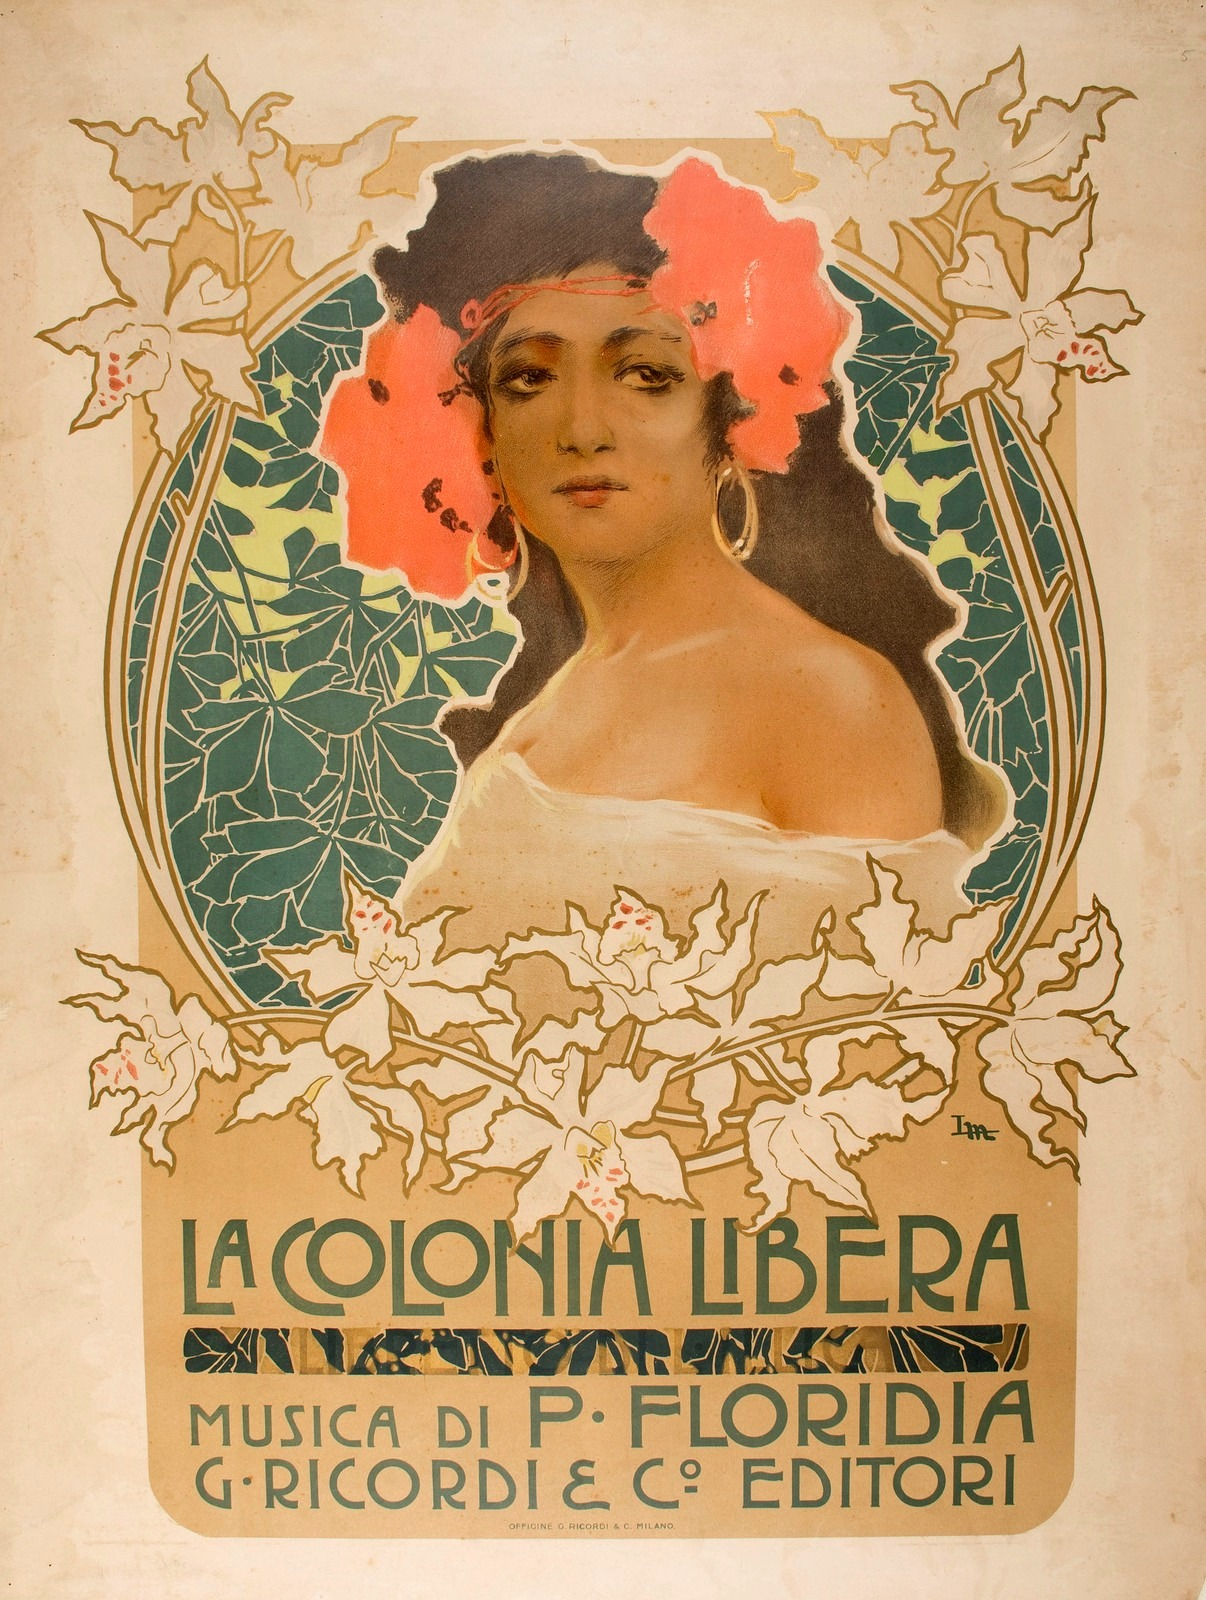 1903_Плакат (Poster La Colonia Libera)_73.7 x 56.8_цветная литография.jpg